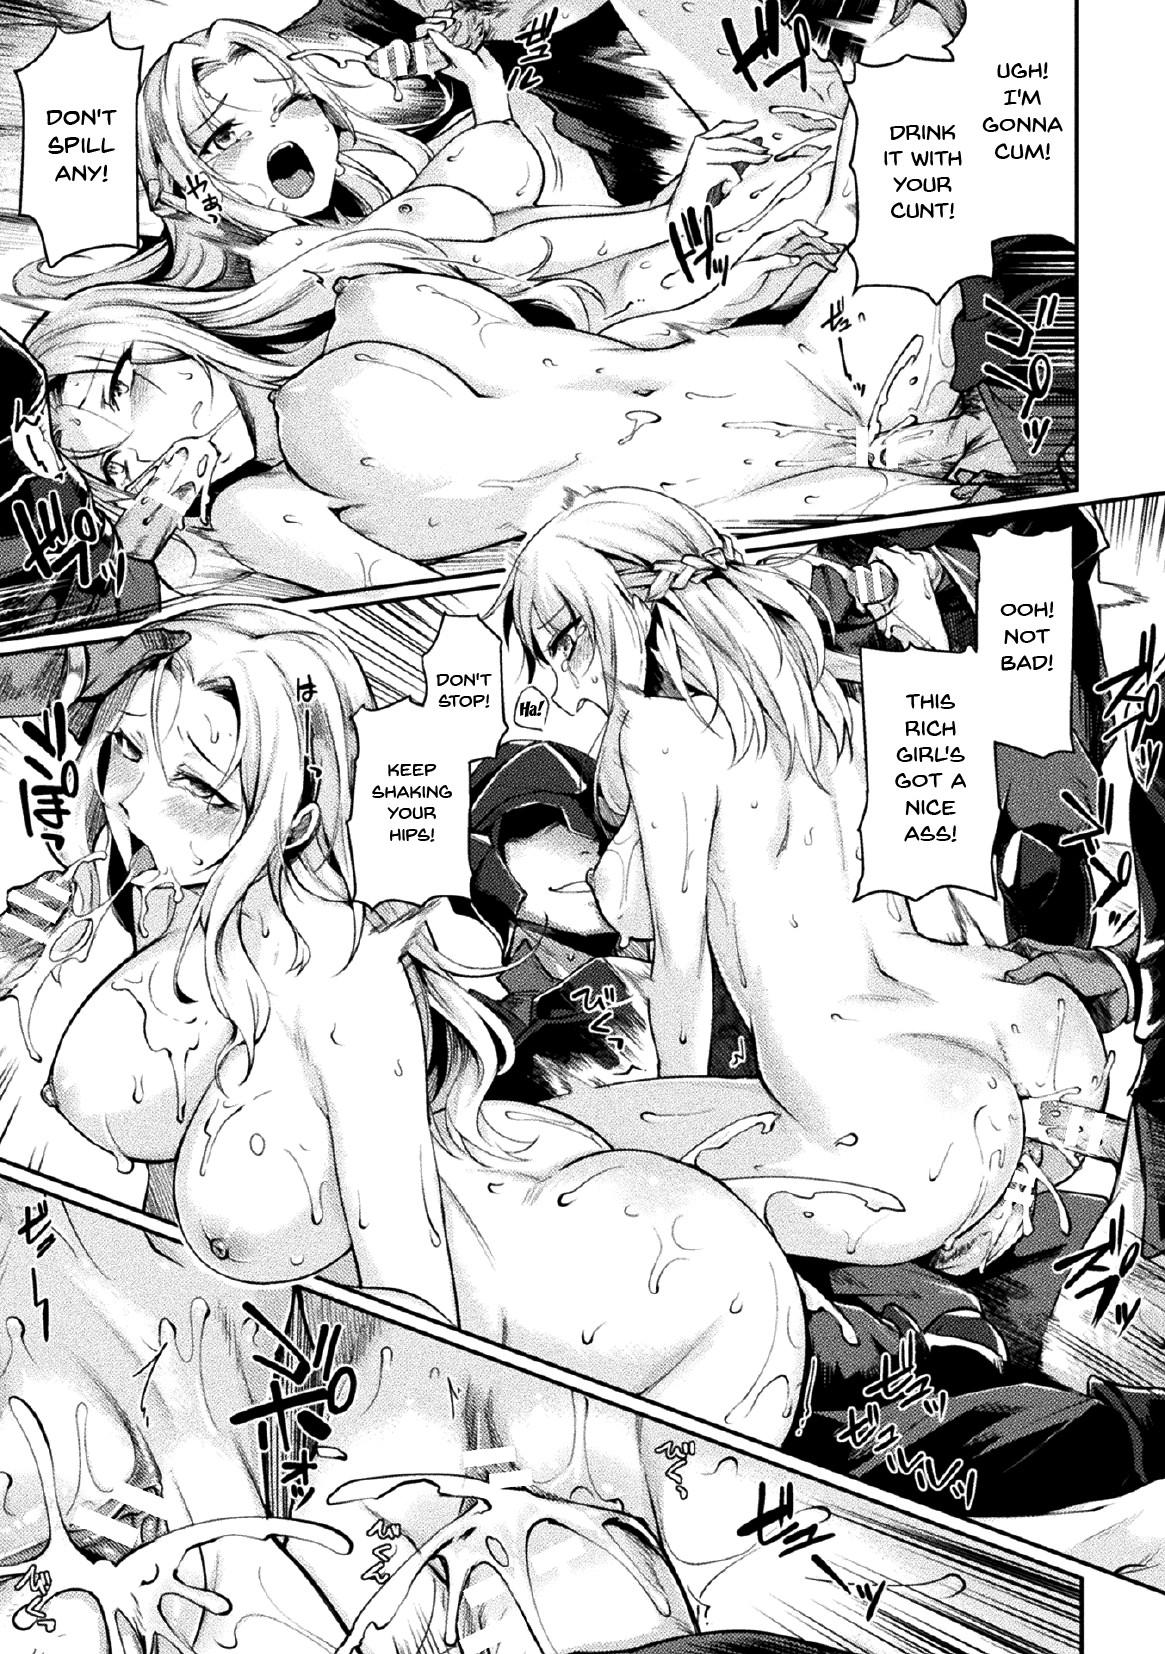 [Tsukitokage] Kuroinu II ~Inyoku ni Somaru Haitoku no Miyako, Futatabi~ THE COMIC   Kuroinu II ~Corrupted Town Stained With Lust~ THE COMIC Ch. 1 (Haiboku Otome Ecstasy Vol. 17) [English] {Doujins.com} [Digital] 2